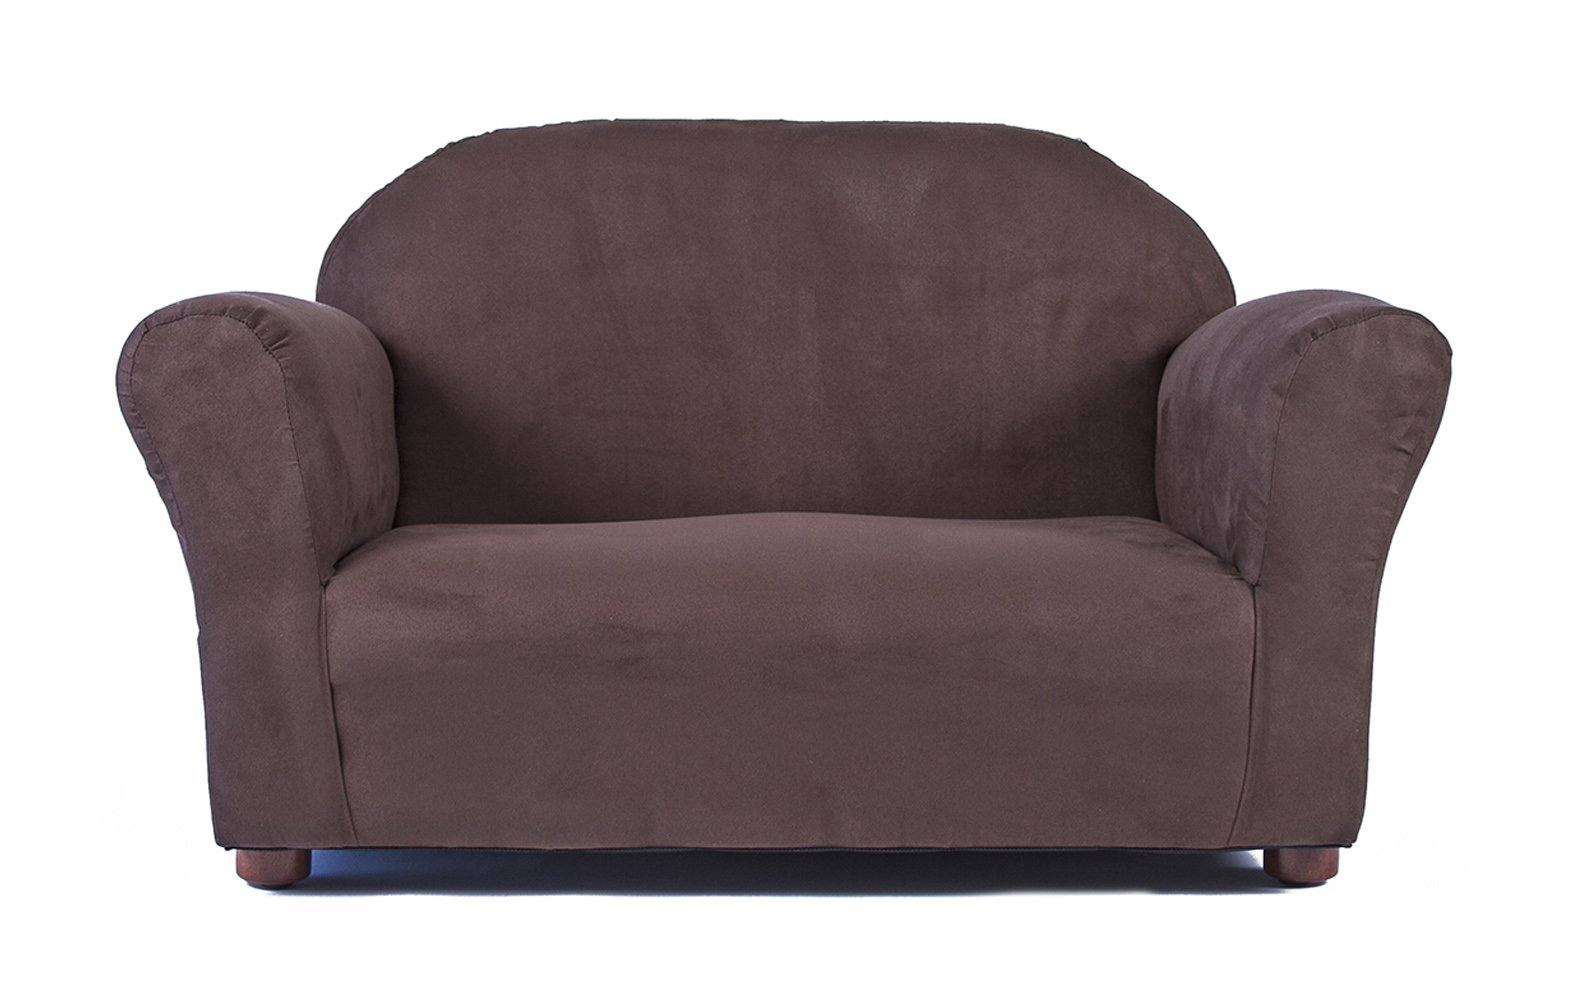 Keet Roundy Microsuede Children's Sofa, Brown by Keet